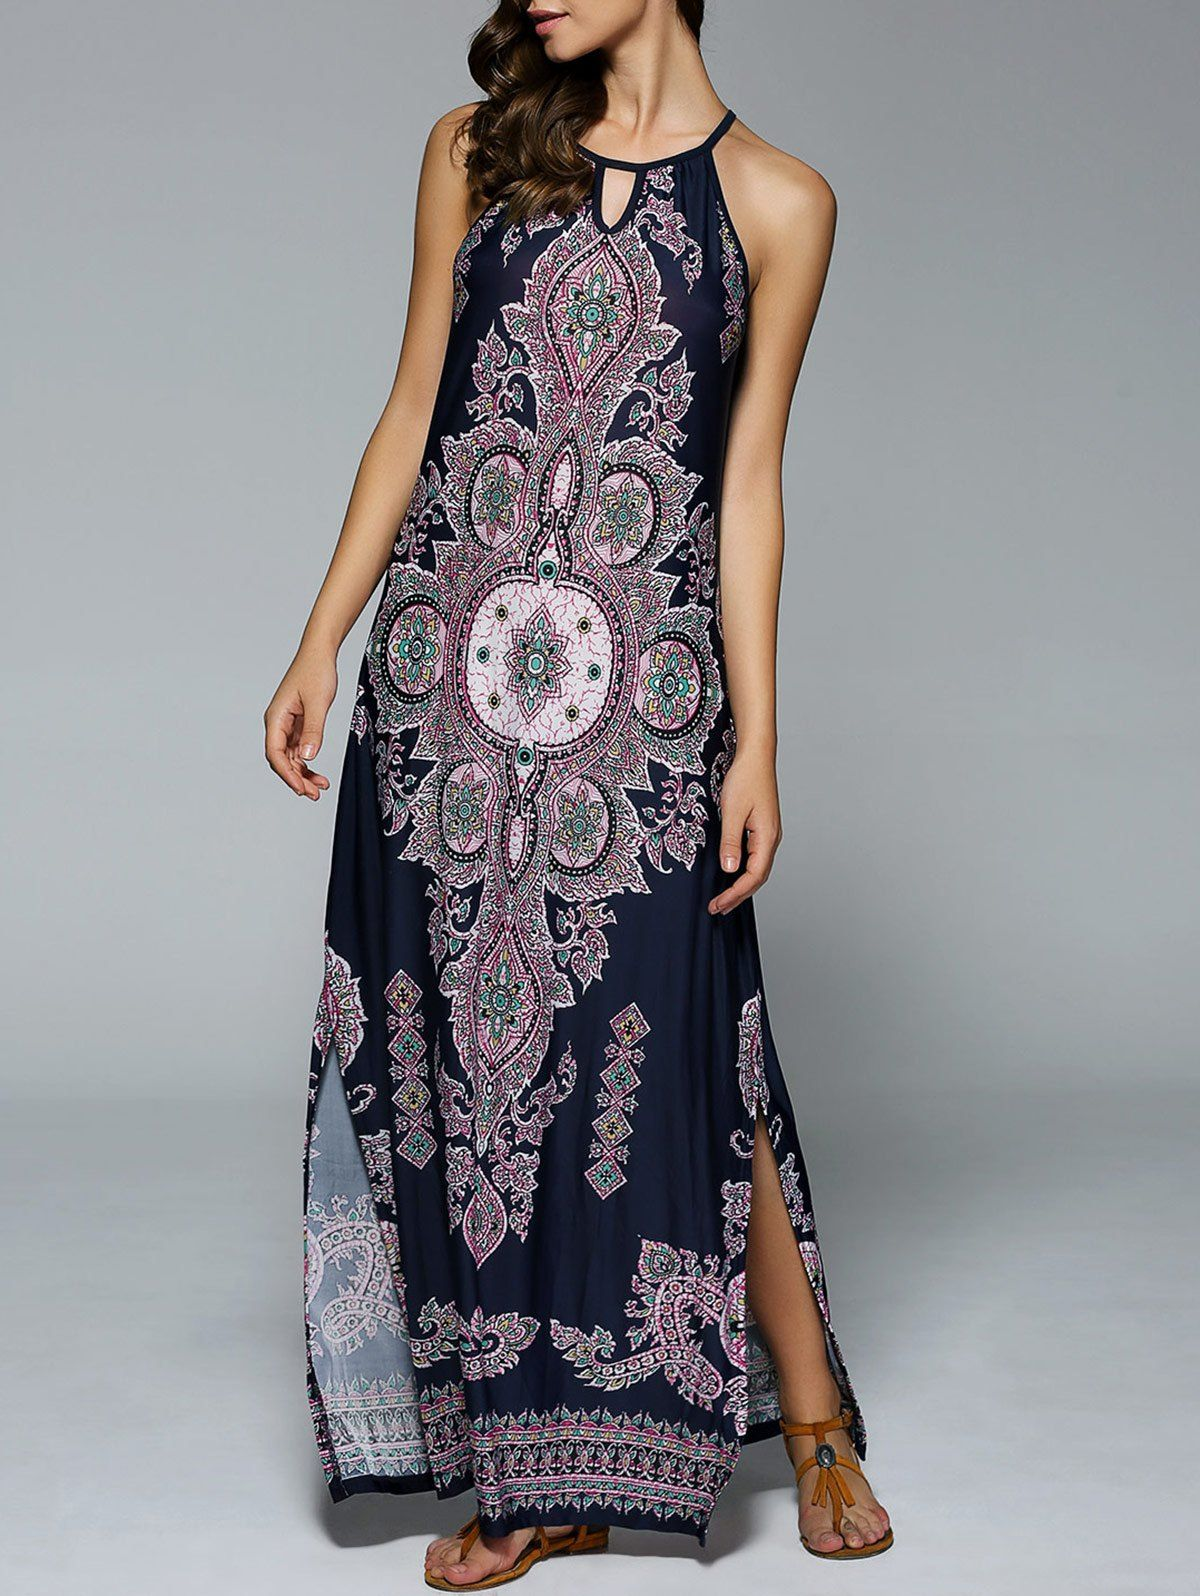 Side Slit Tribal Printed Maxi Dress | Tribal maxi dresses, Tribal ...